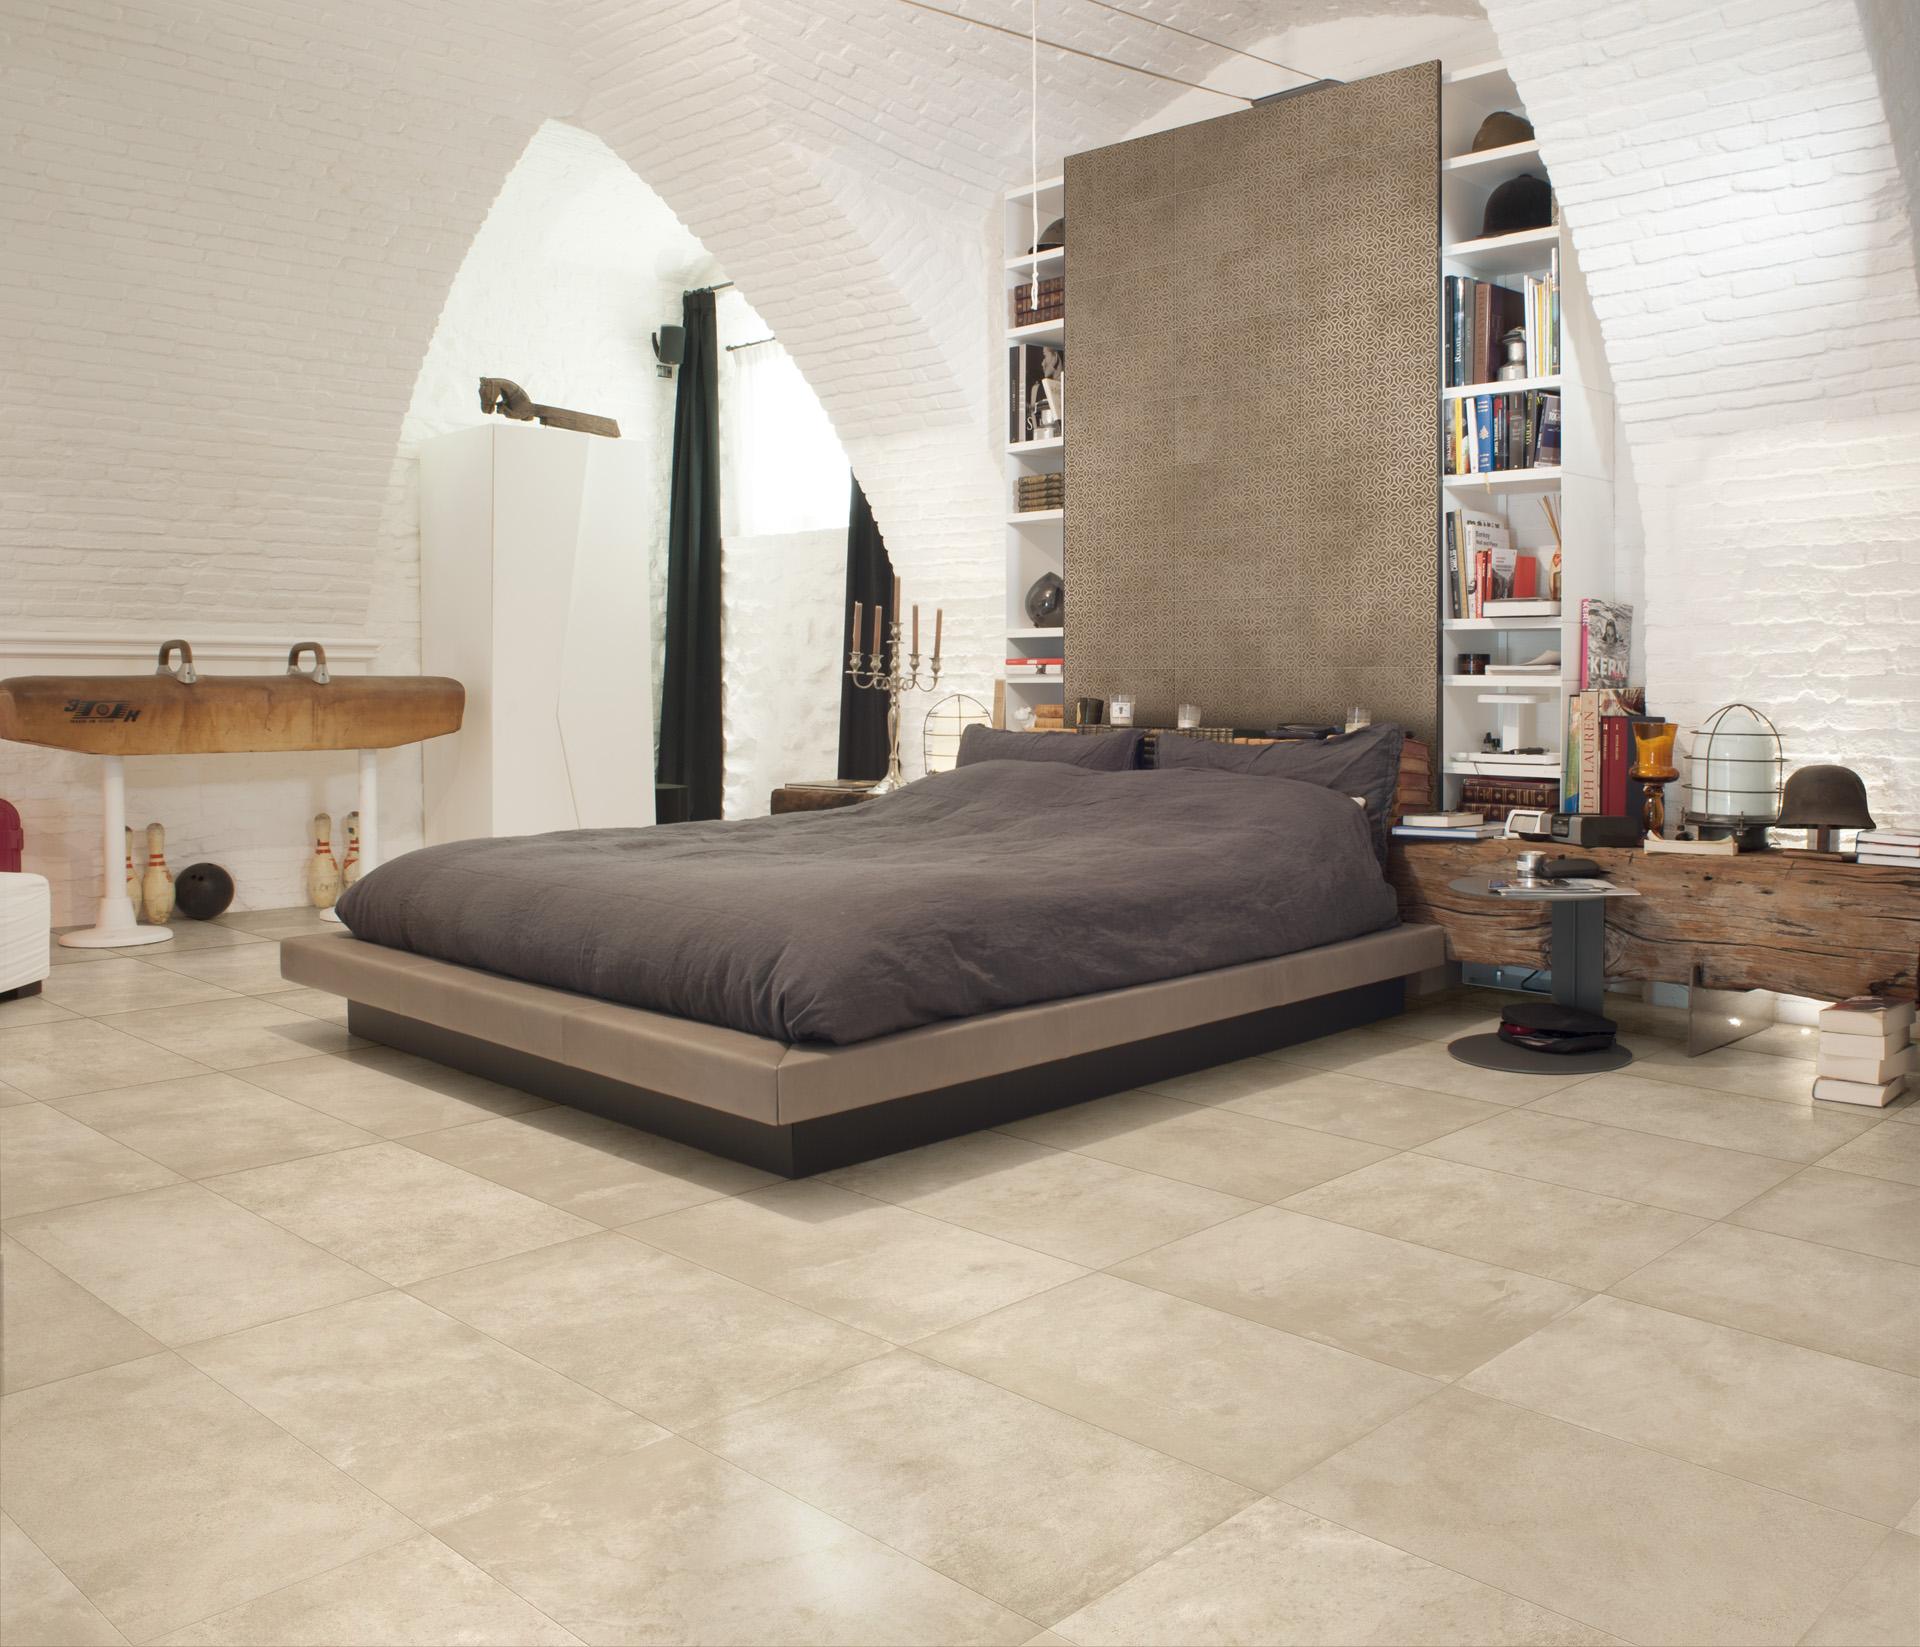 Stil_casa_belsito_cosenza_bbls_group_paviment_rivestimenti_arredo_bagno_18